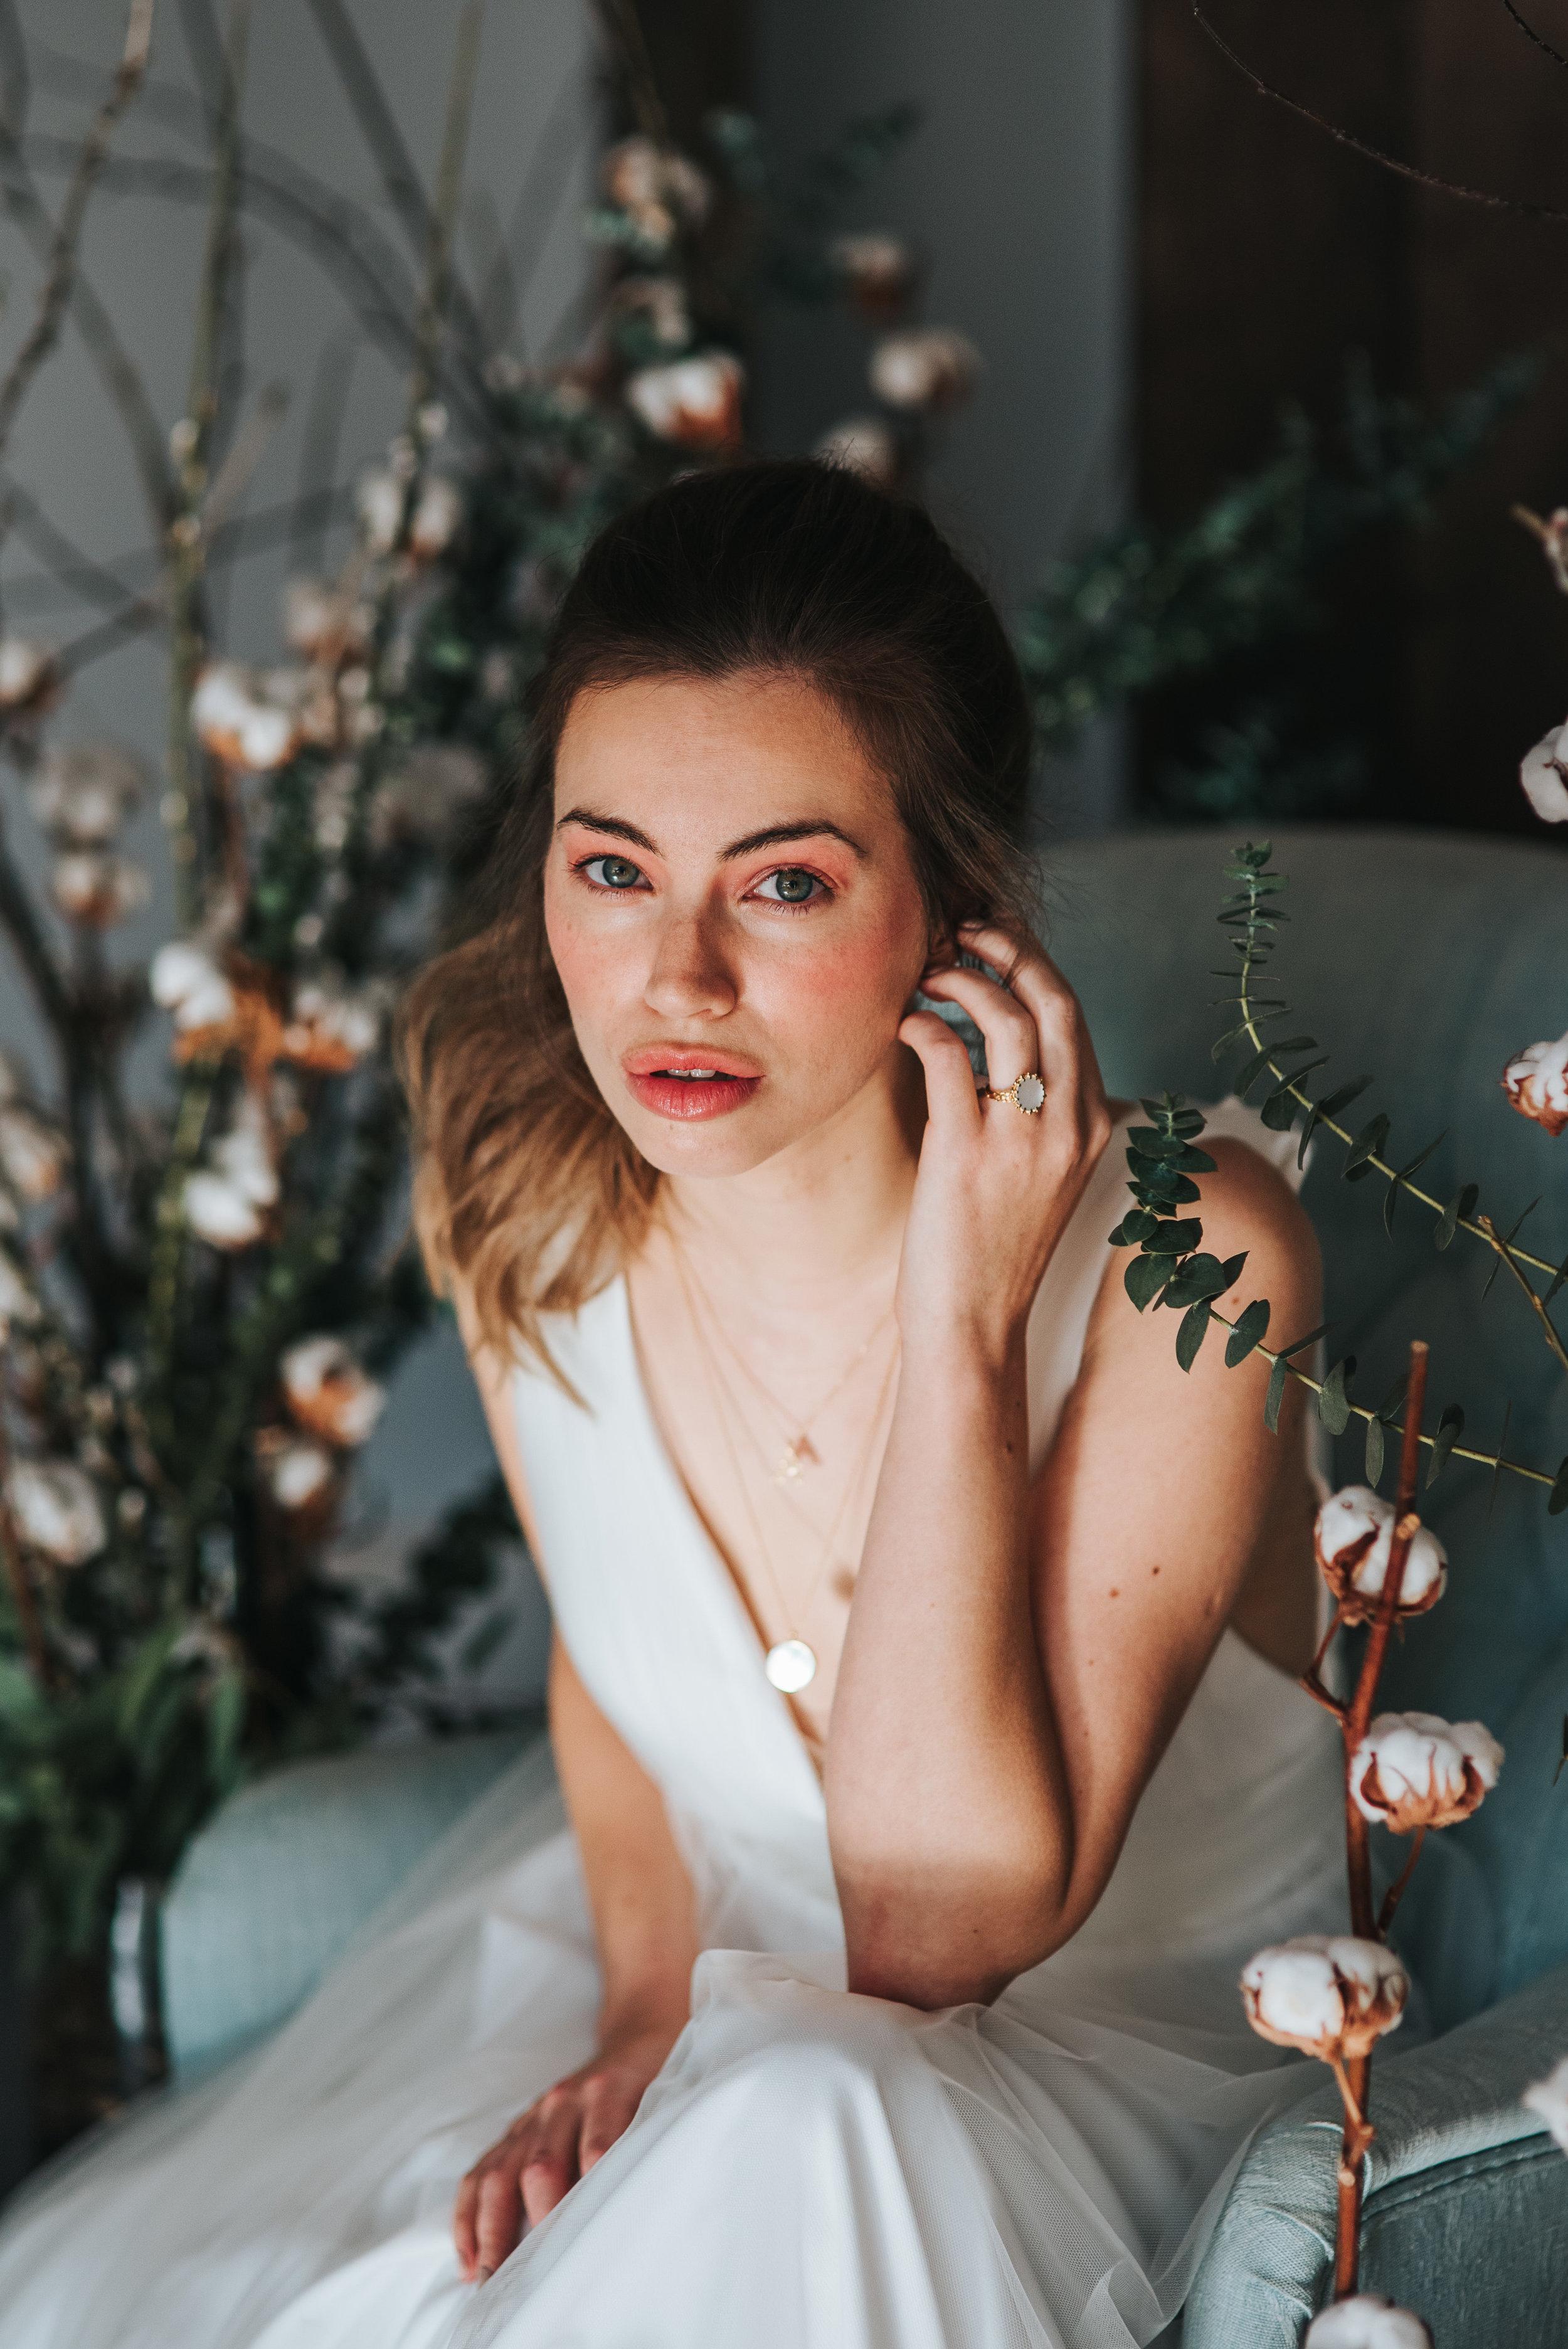 balinese-inspired-bride-jenny-packham-jesus-peiro-suzanne-neville